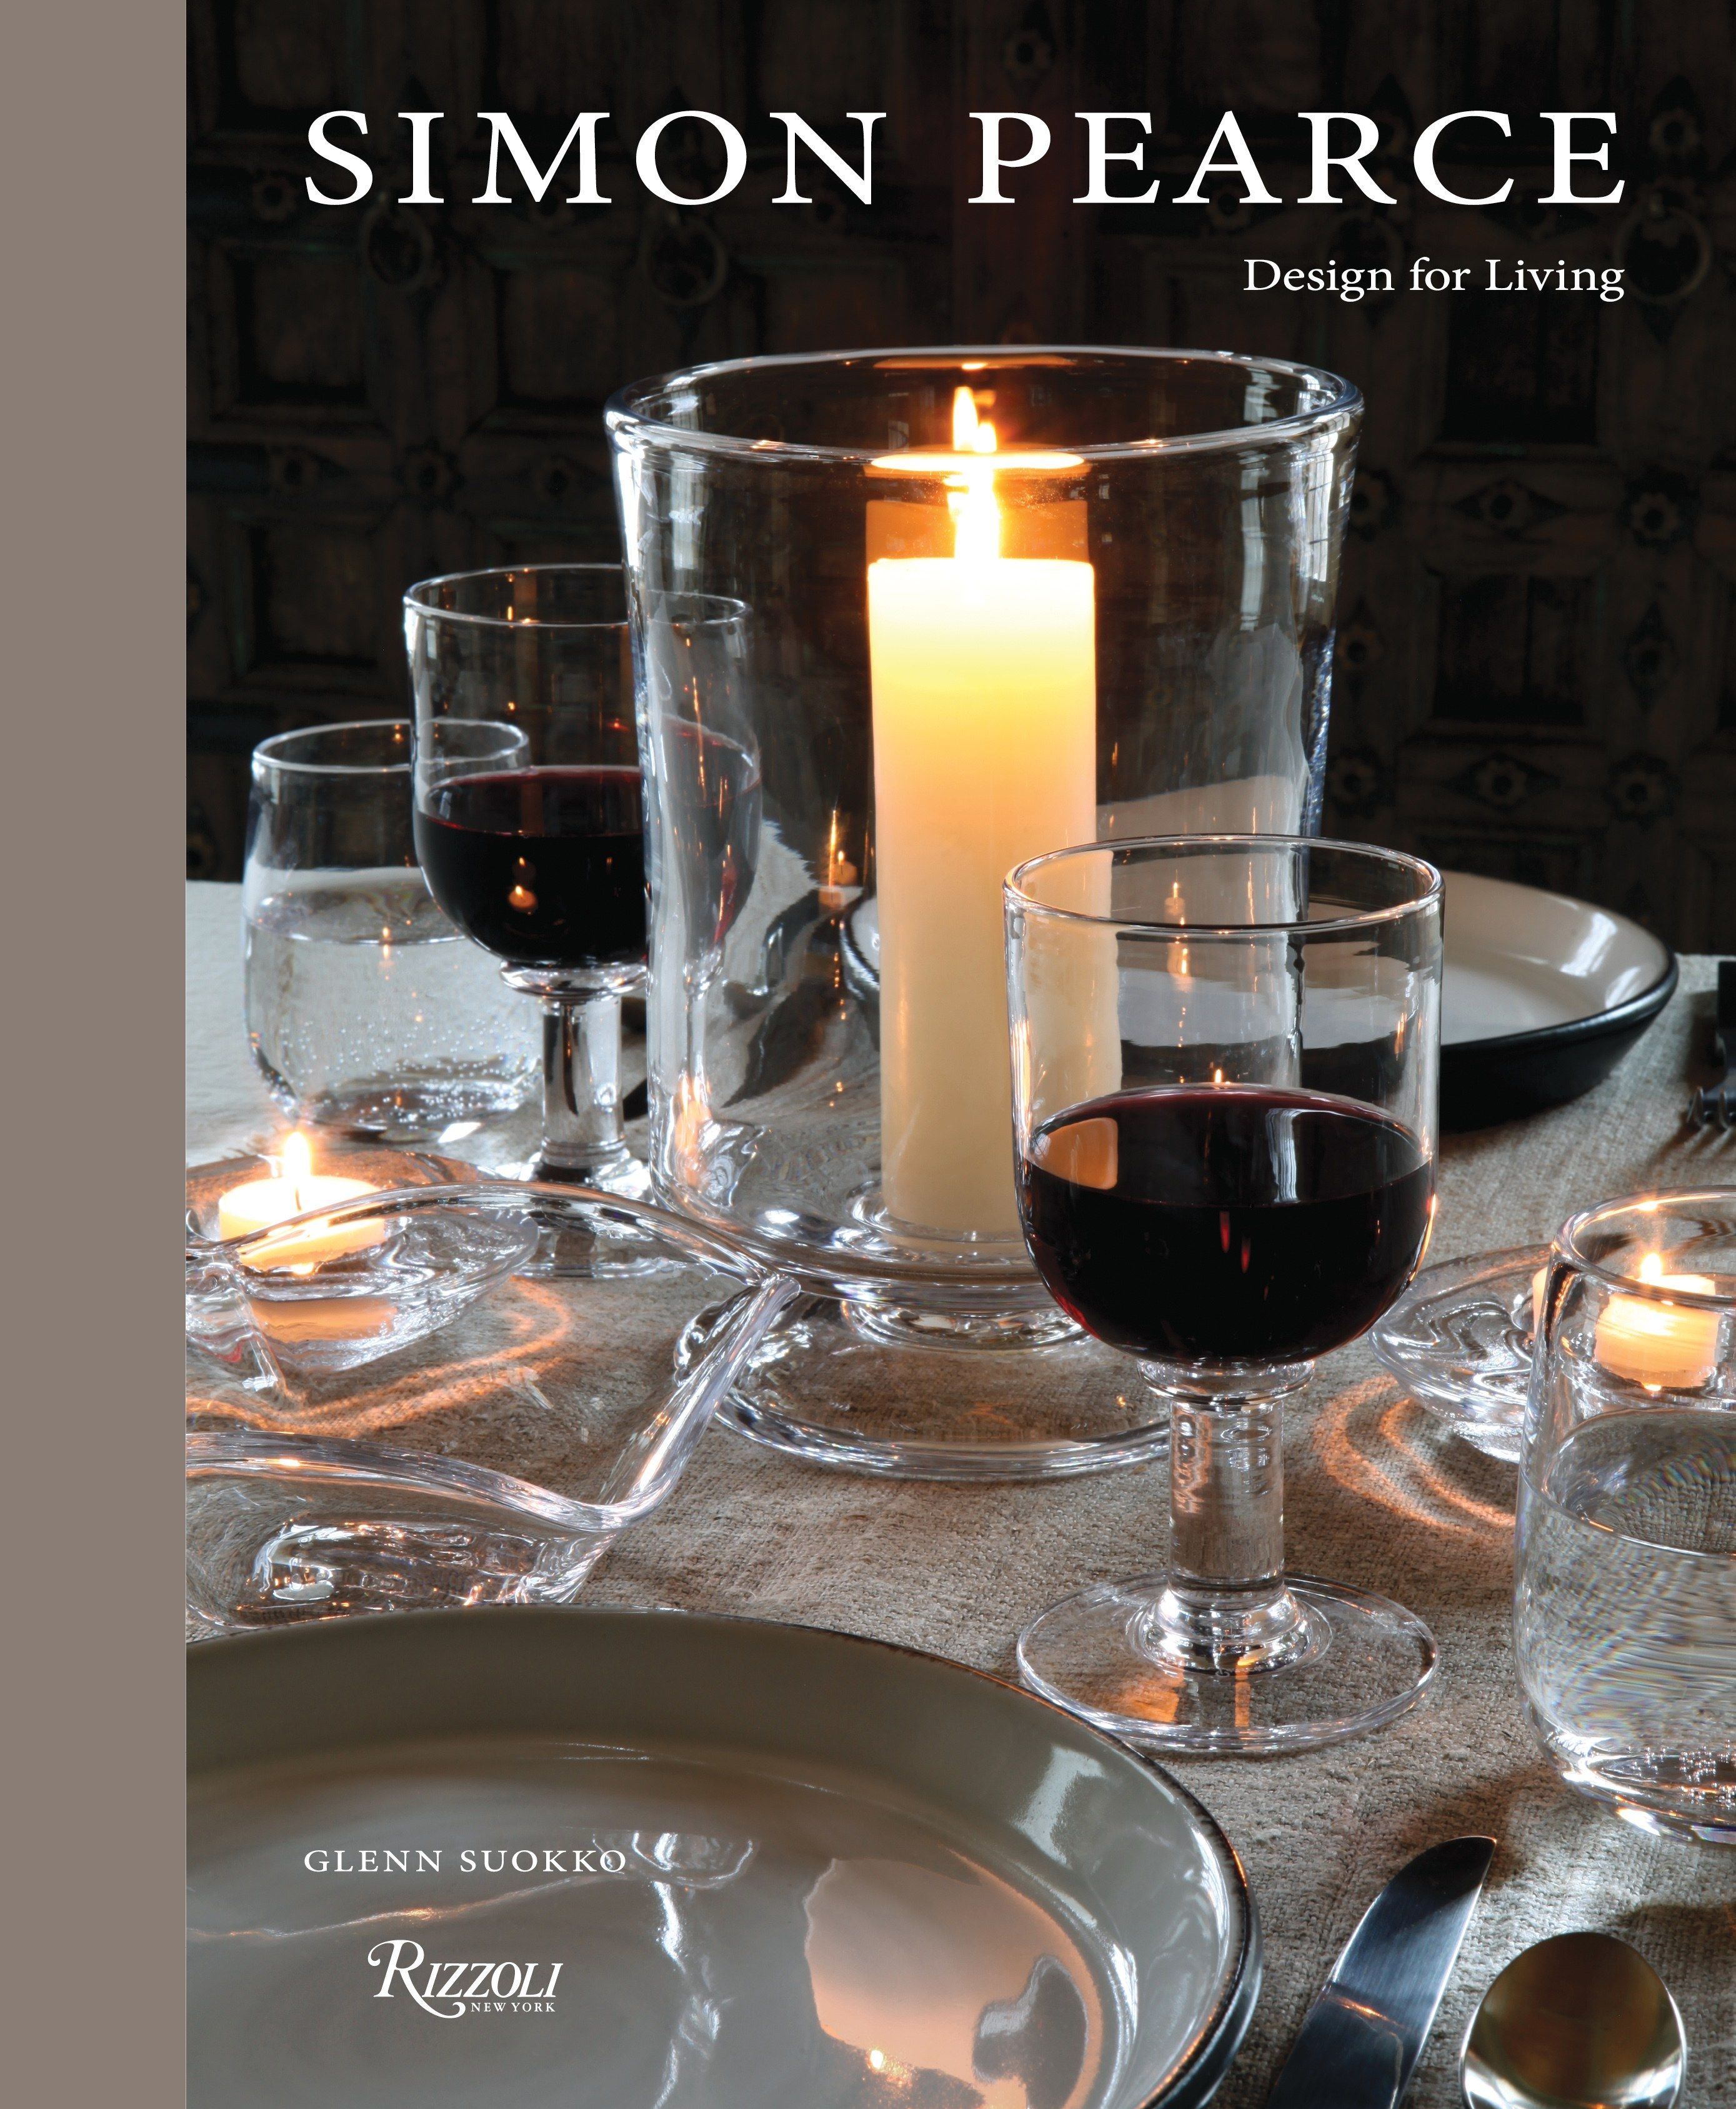 Legendary Glassmaker Simon Pearce Photos | Architectural Digest